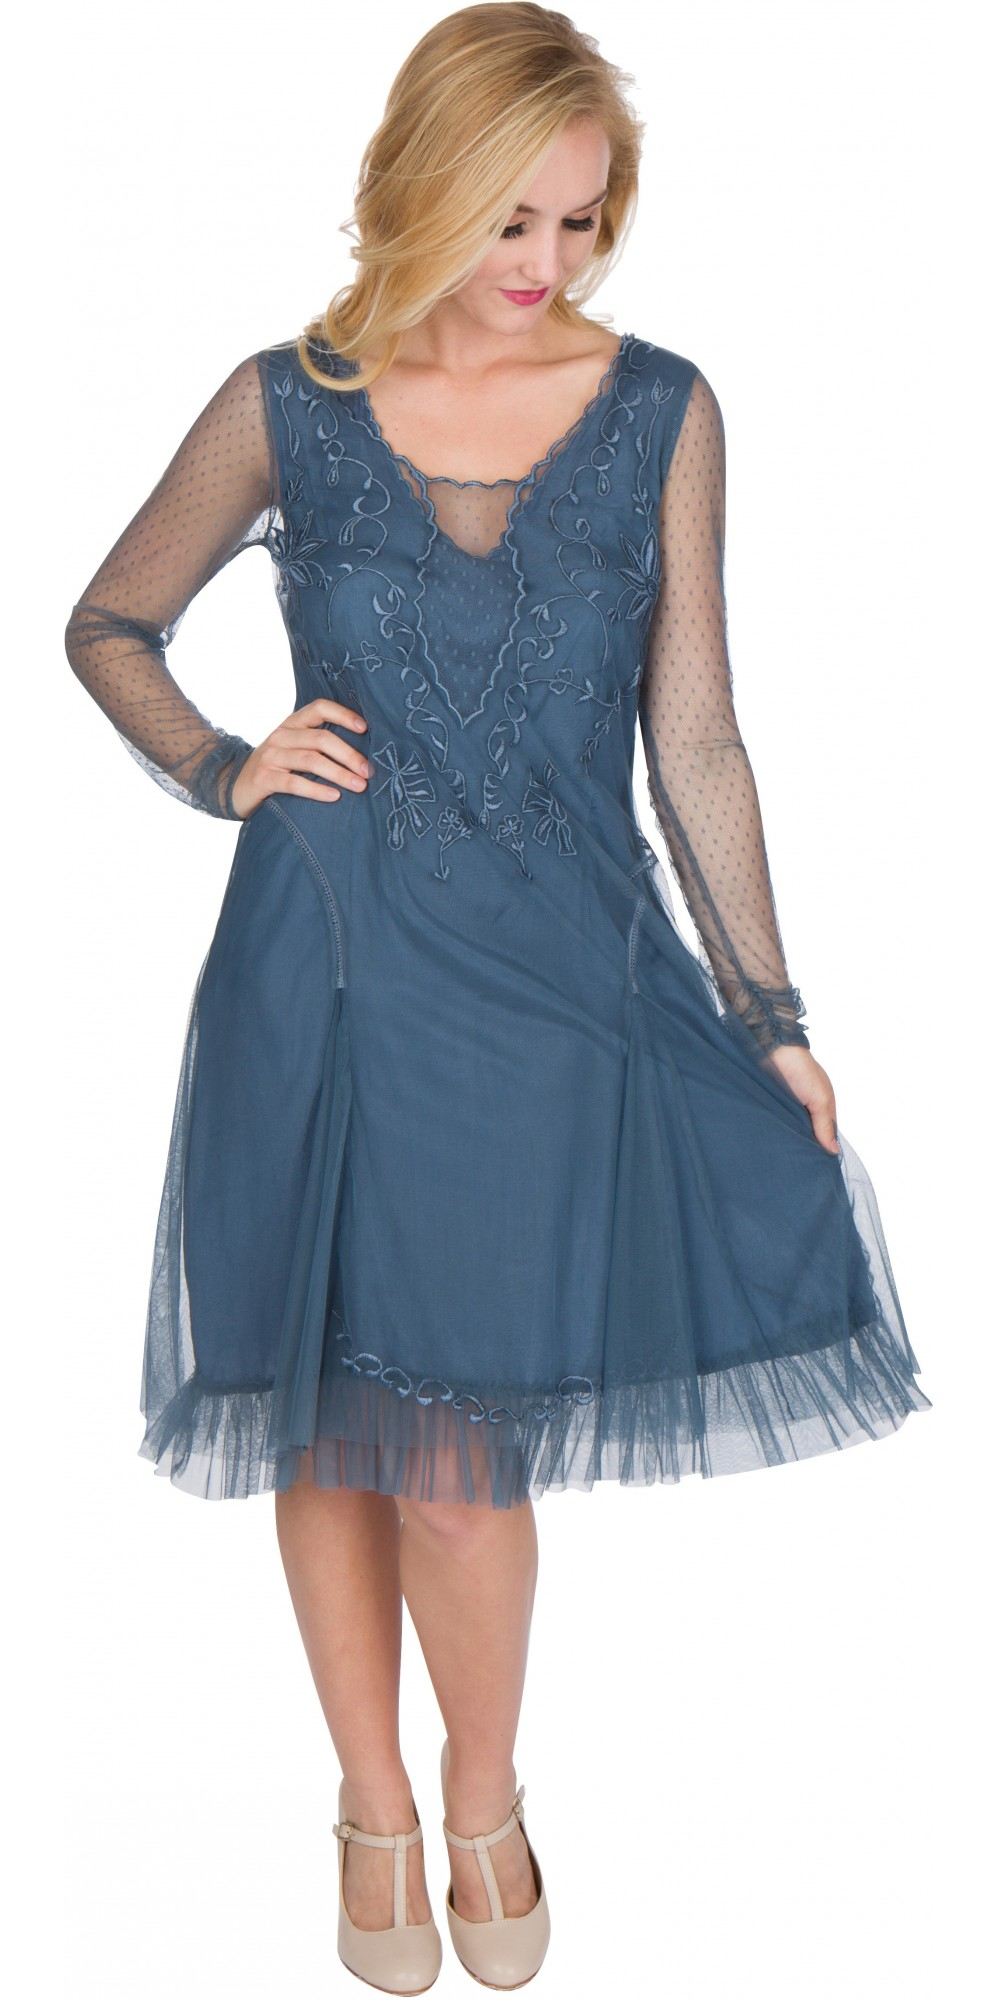 Nataya AL-252 Serenity Vintage Style Party Dress in Sapphire - NEW ...